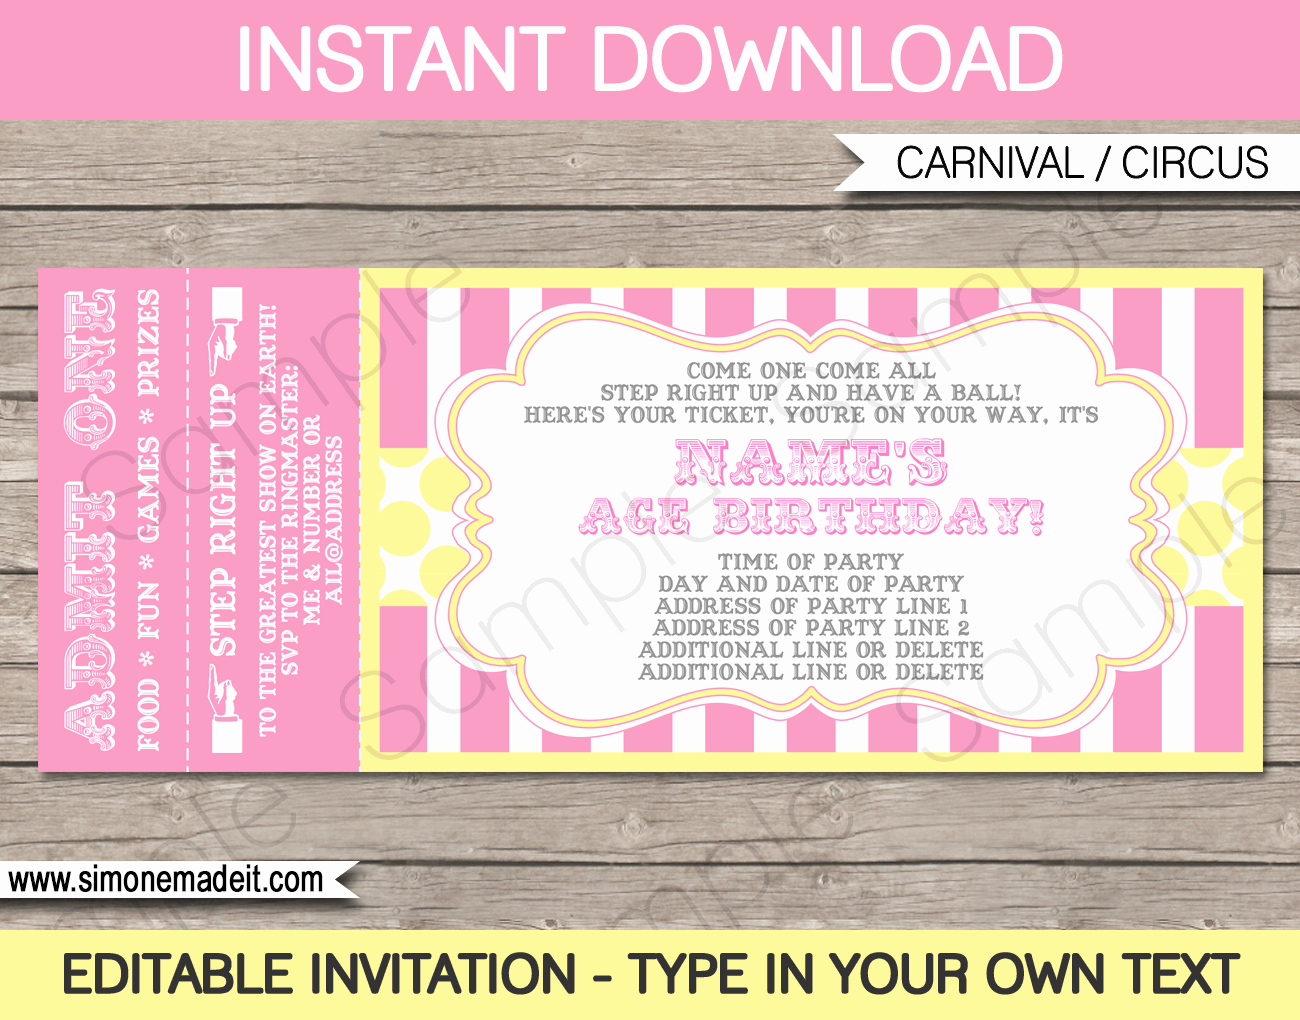 Carnival Ticket Birthday Invitations Best Of Carnival Birthday Ticket Invitations Template